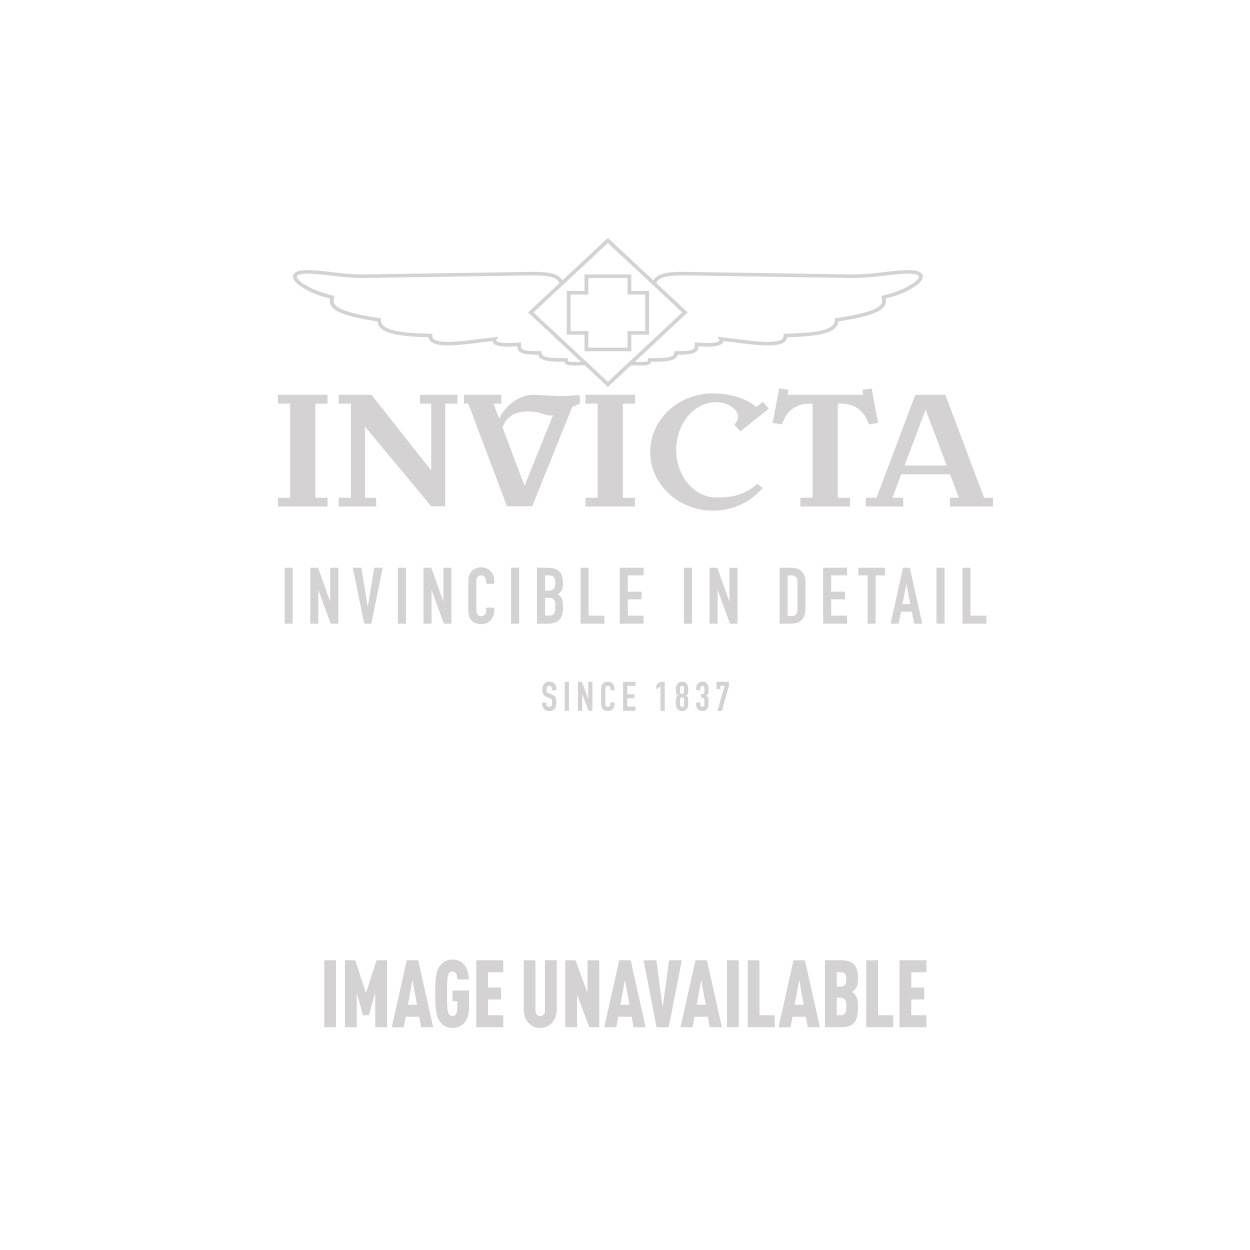 79a044808 Invicta Pro Diver men watches in Gold - Model 8929OB